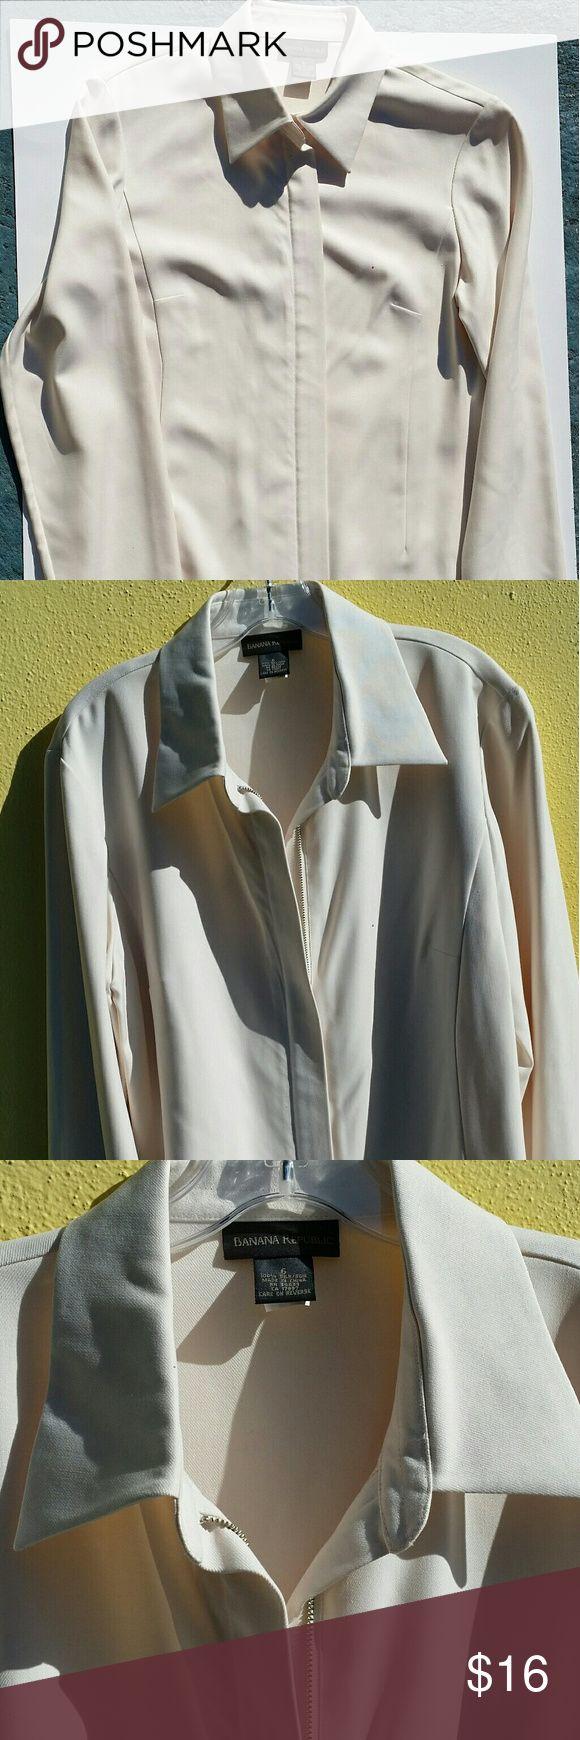 BANANA REPUBLIC  100% SILK ZIP UP JACKET - 6 Banana republic women's cream color 100% silk zip up jacket. Banana Republic Jackets & Coats Pea Coats